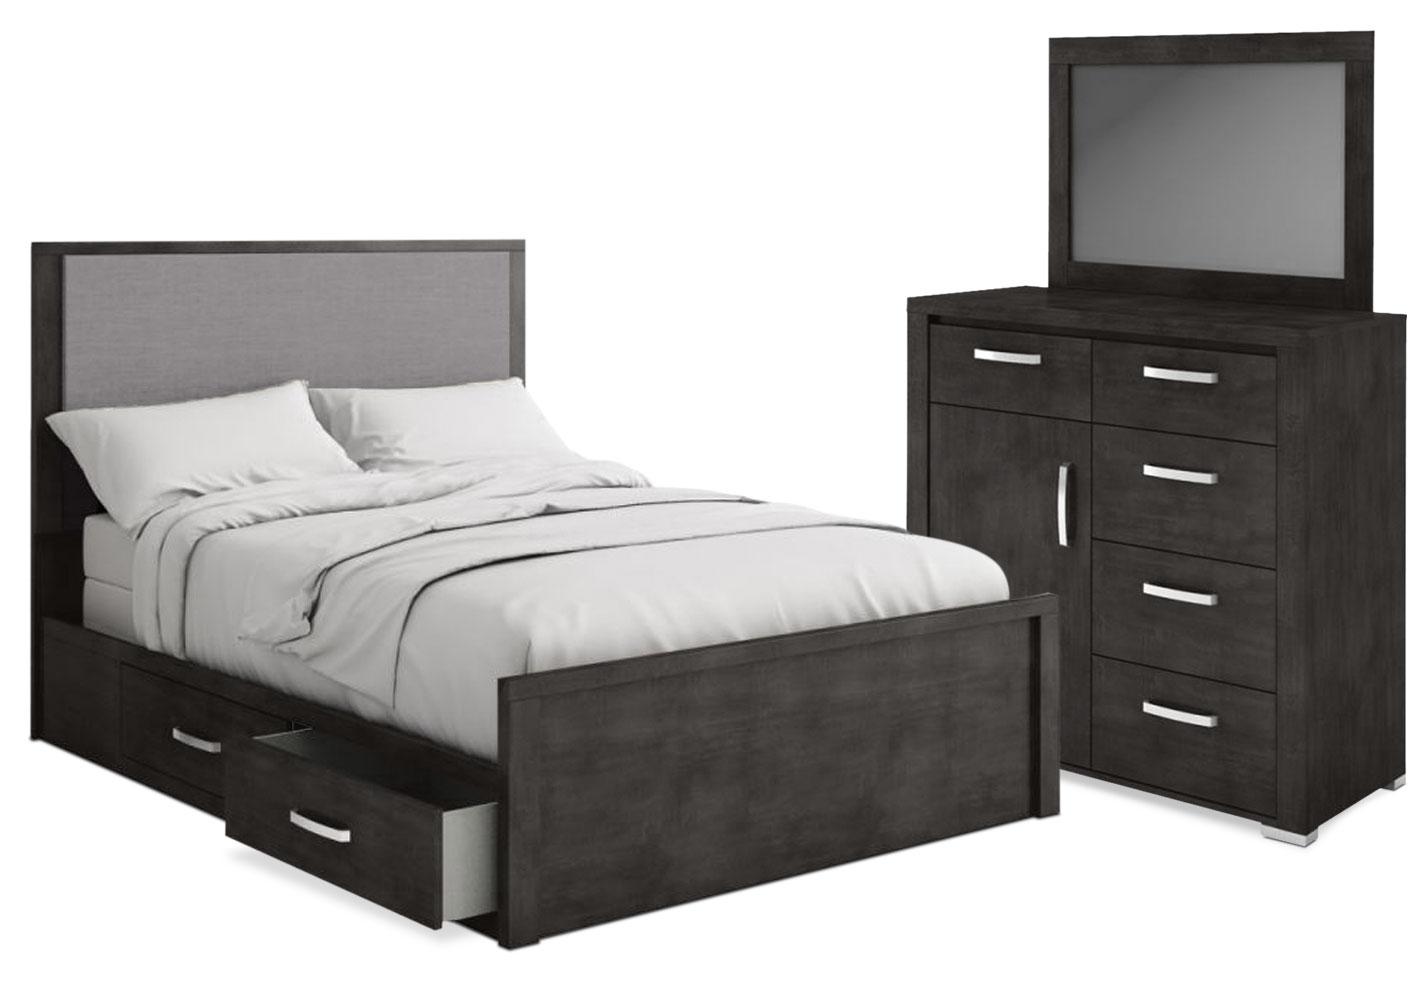 Monaco 5 piece queen storage bedroom package anthracite for Bedroom furniture package deals